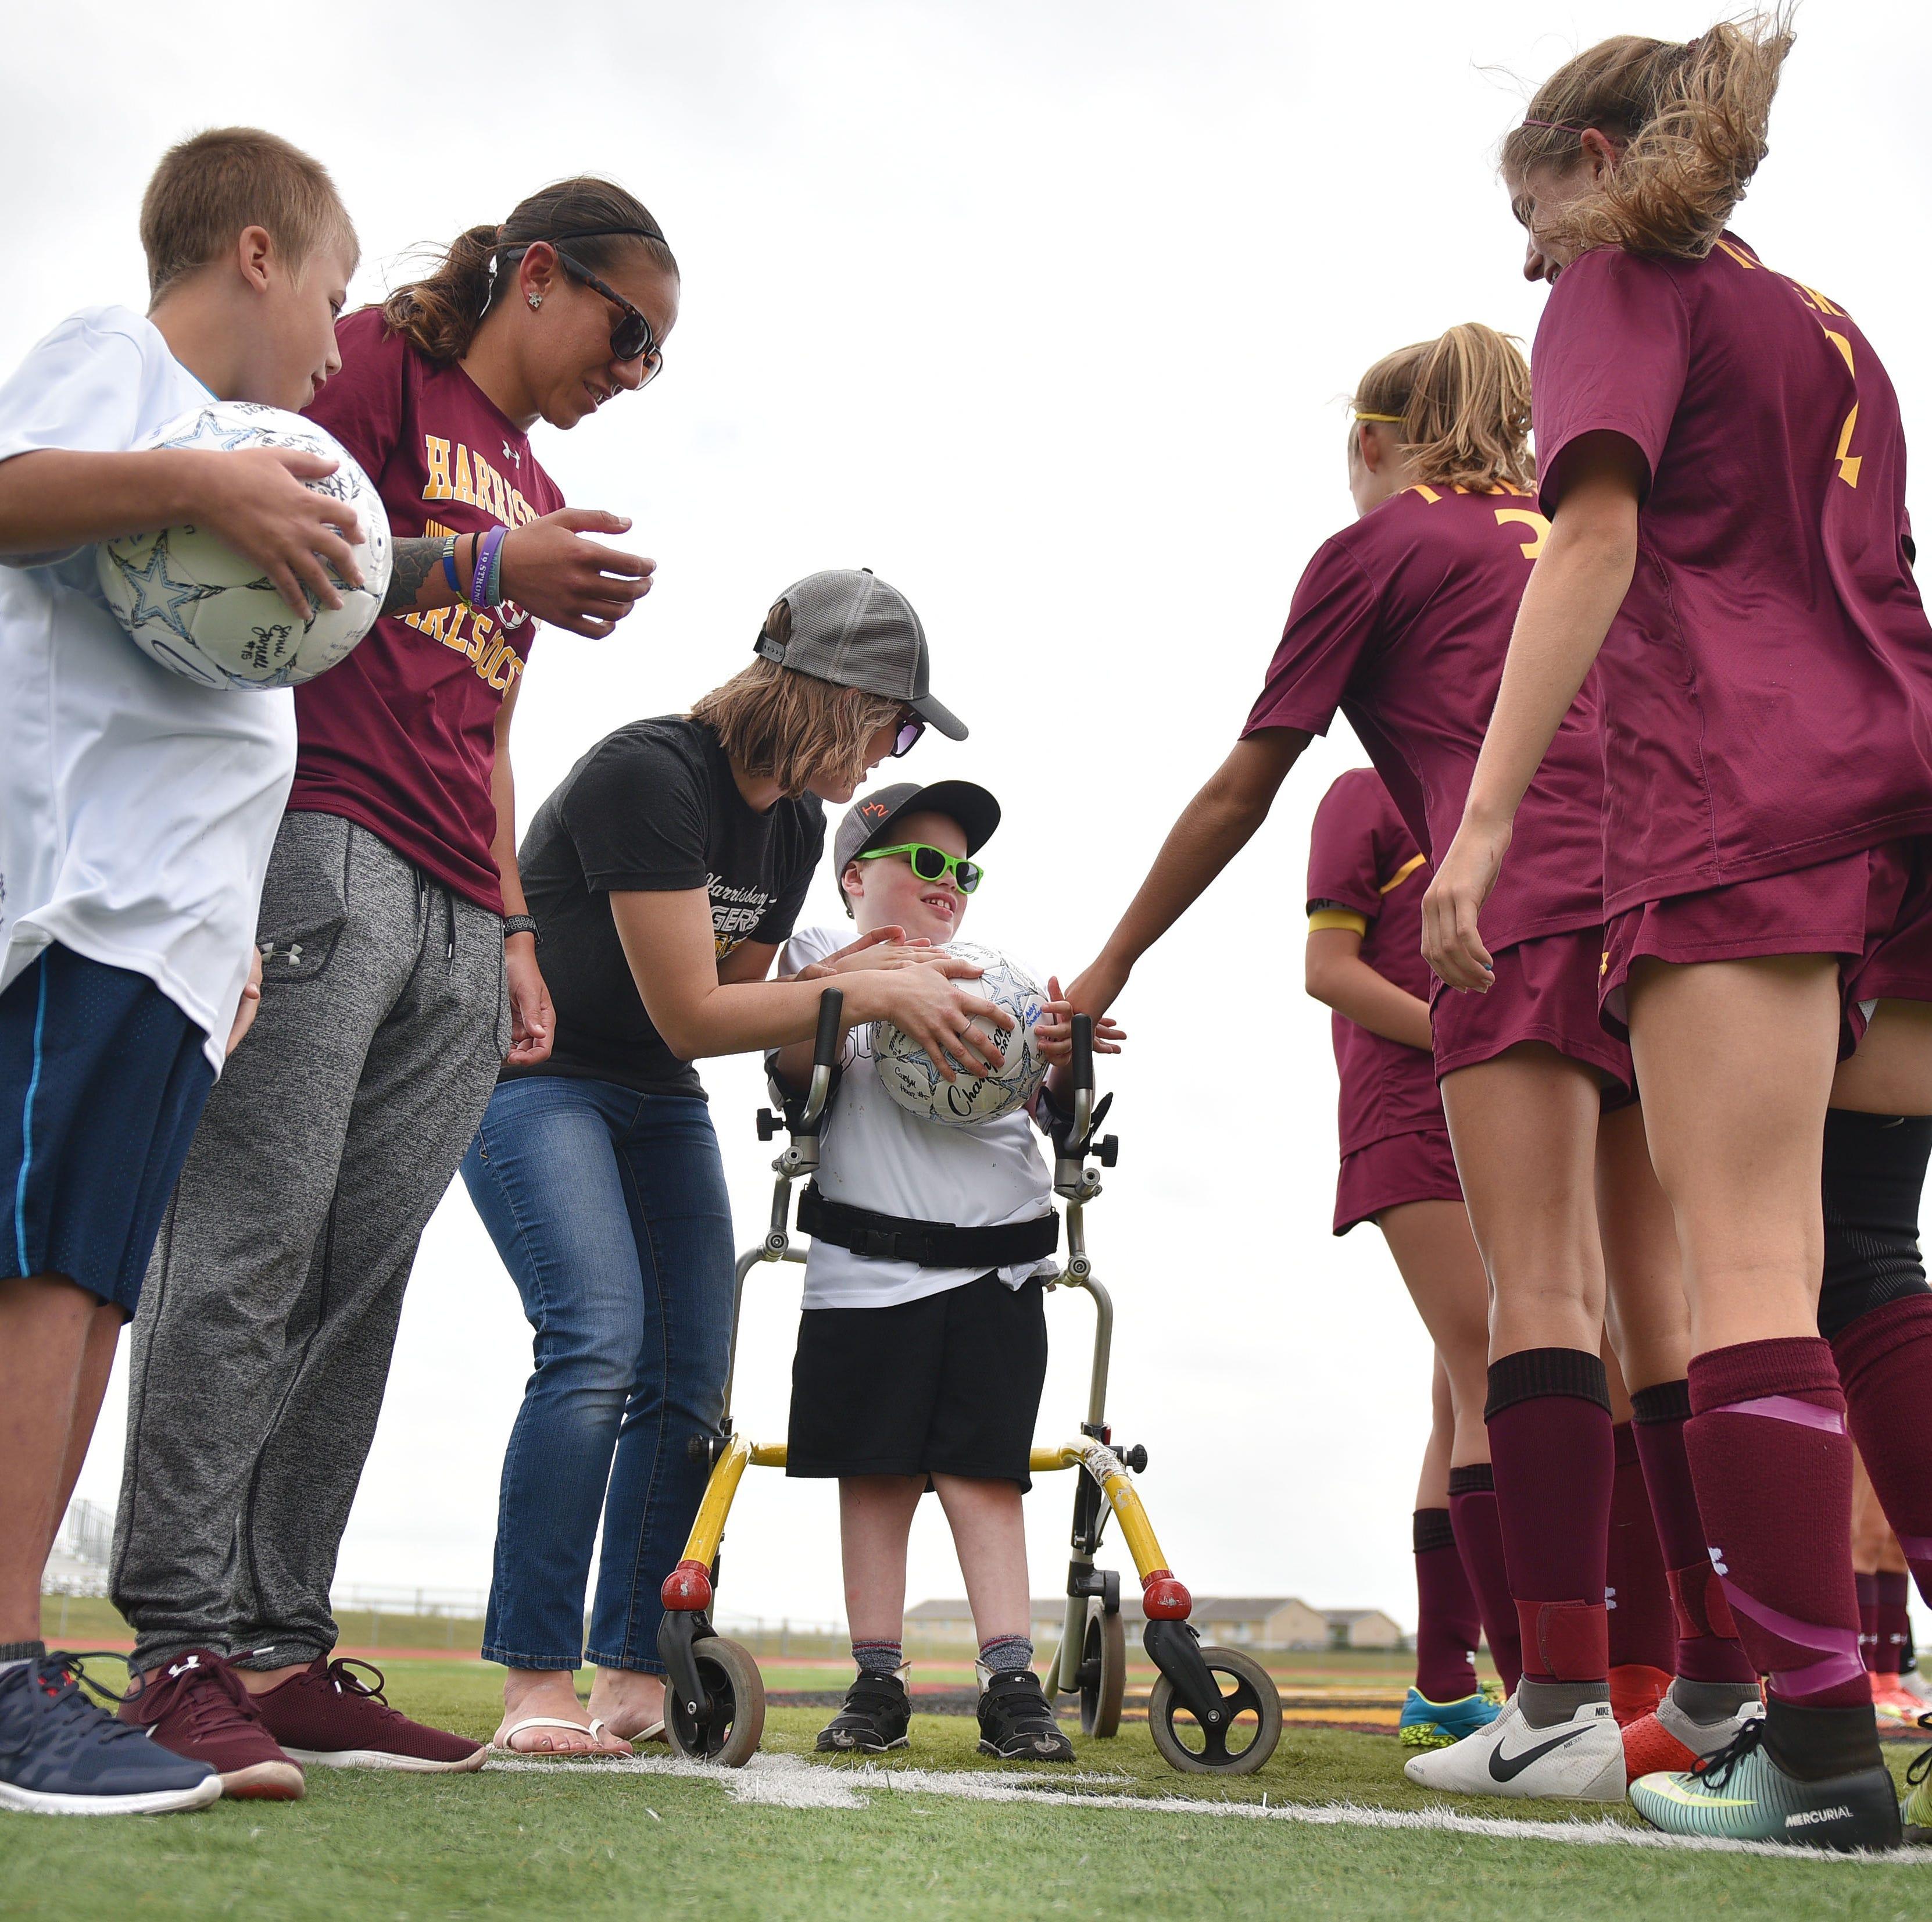 Heroes at heart: Harrisburg soccer team finds higher calling